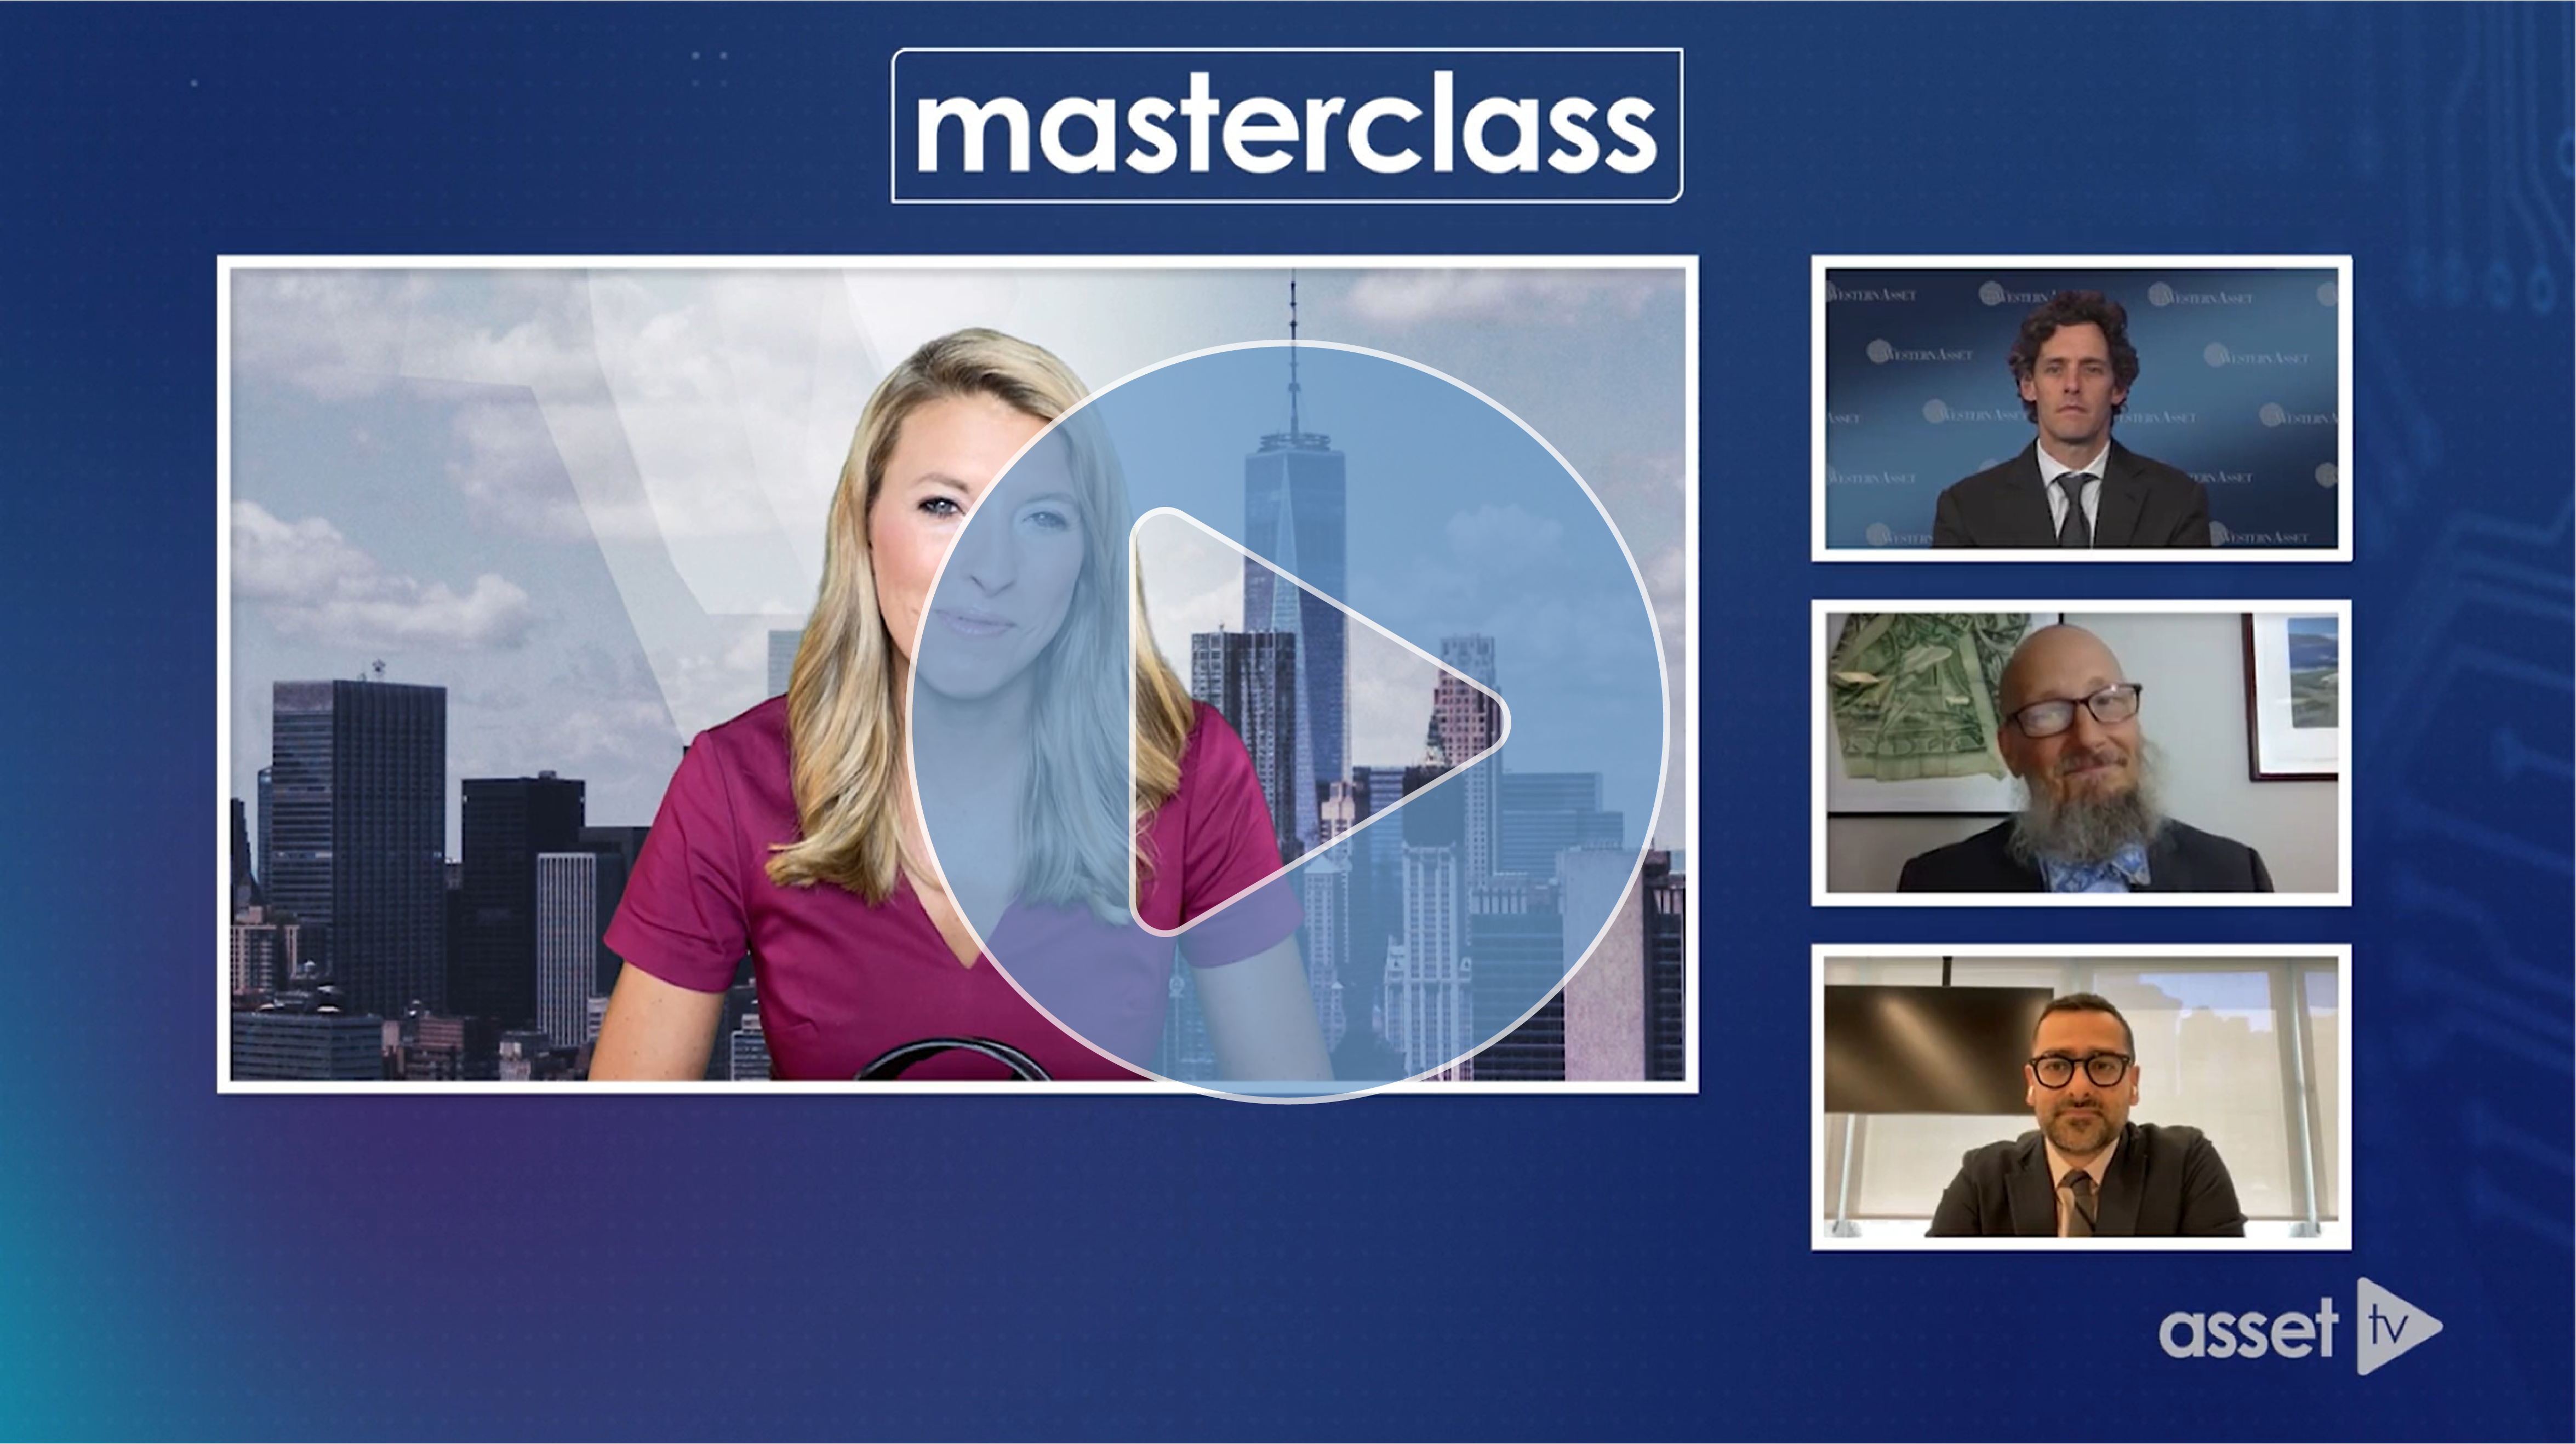 ATV masterclass fixed income 7.21 thumb w play